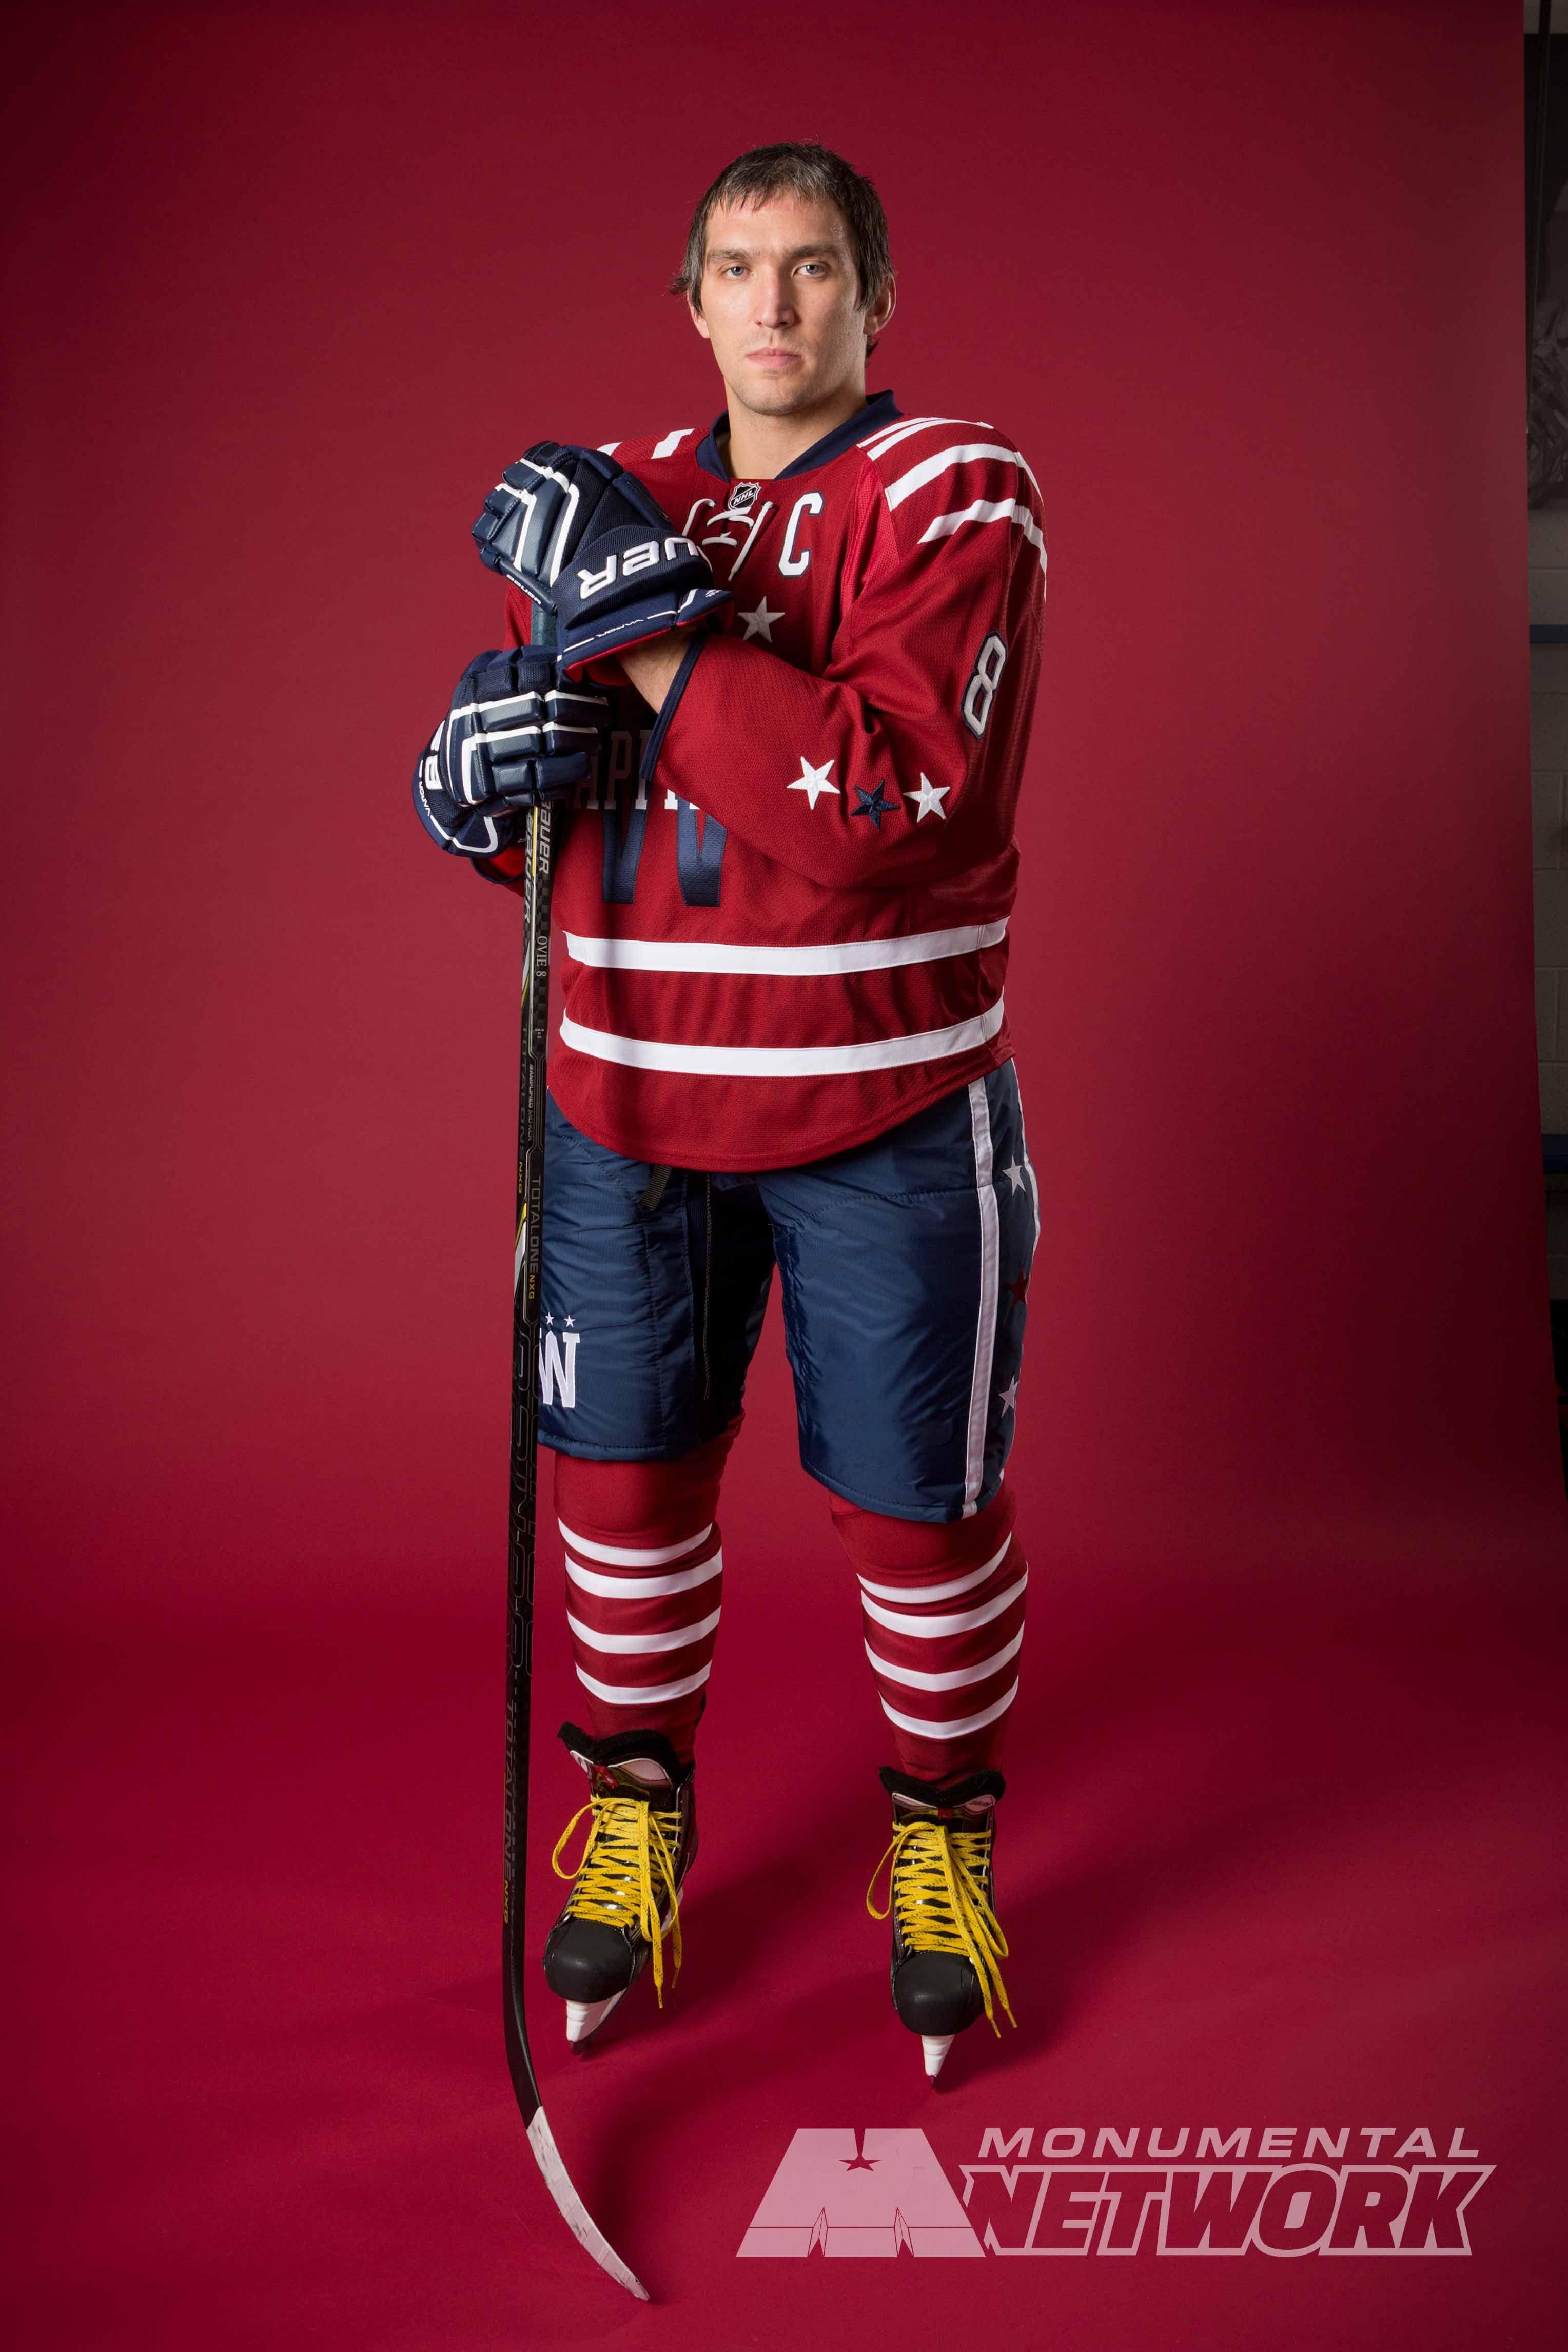 1229dff09d1 Washington Capitals captain Alex Ovechkin shows off the Caps' 2015  Bridgestone NHL Winter Classic® jersey